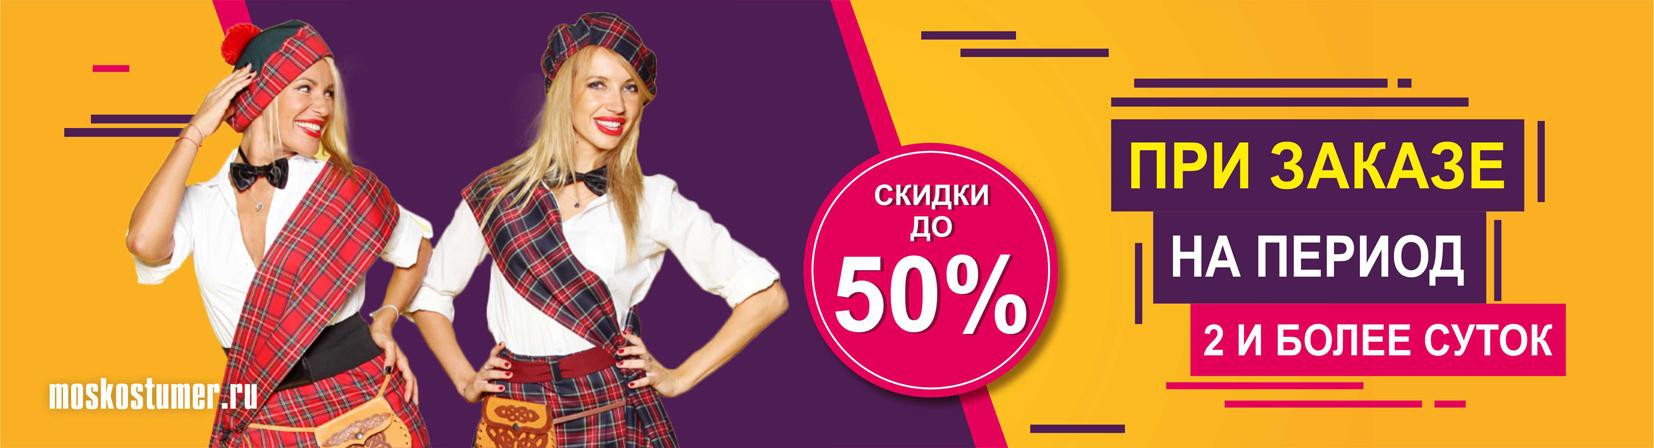 Скидка до 50% при заказе костюмов на период от 2-х суток!